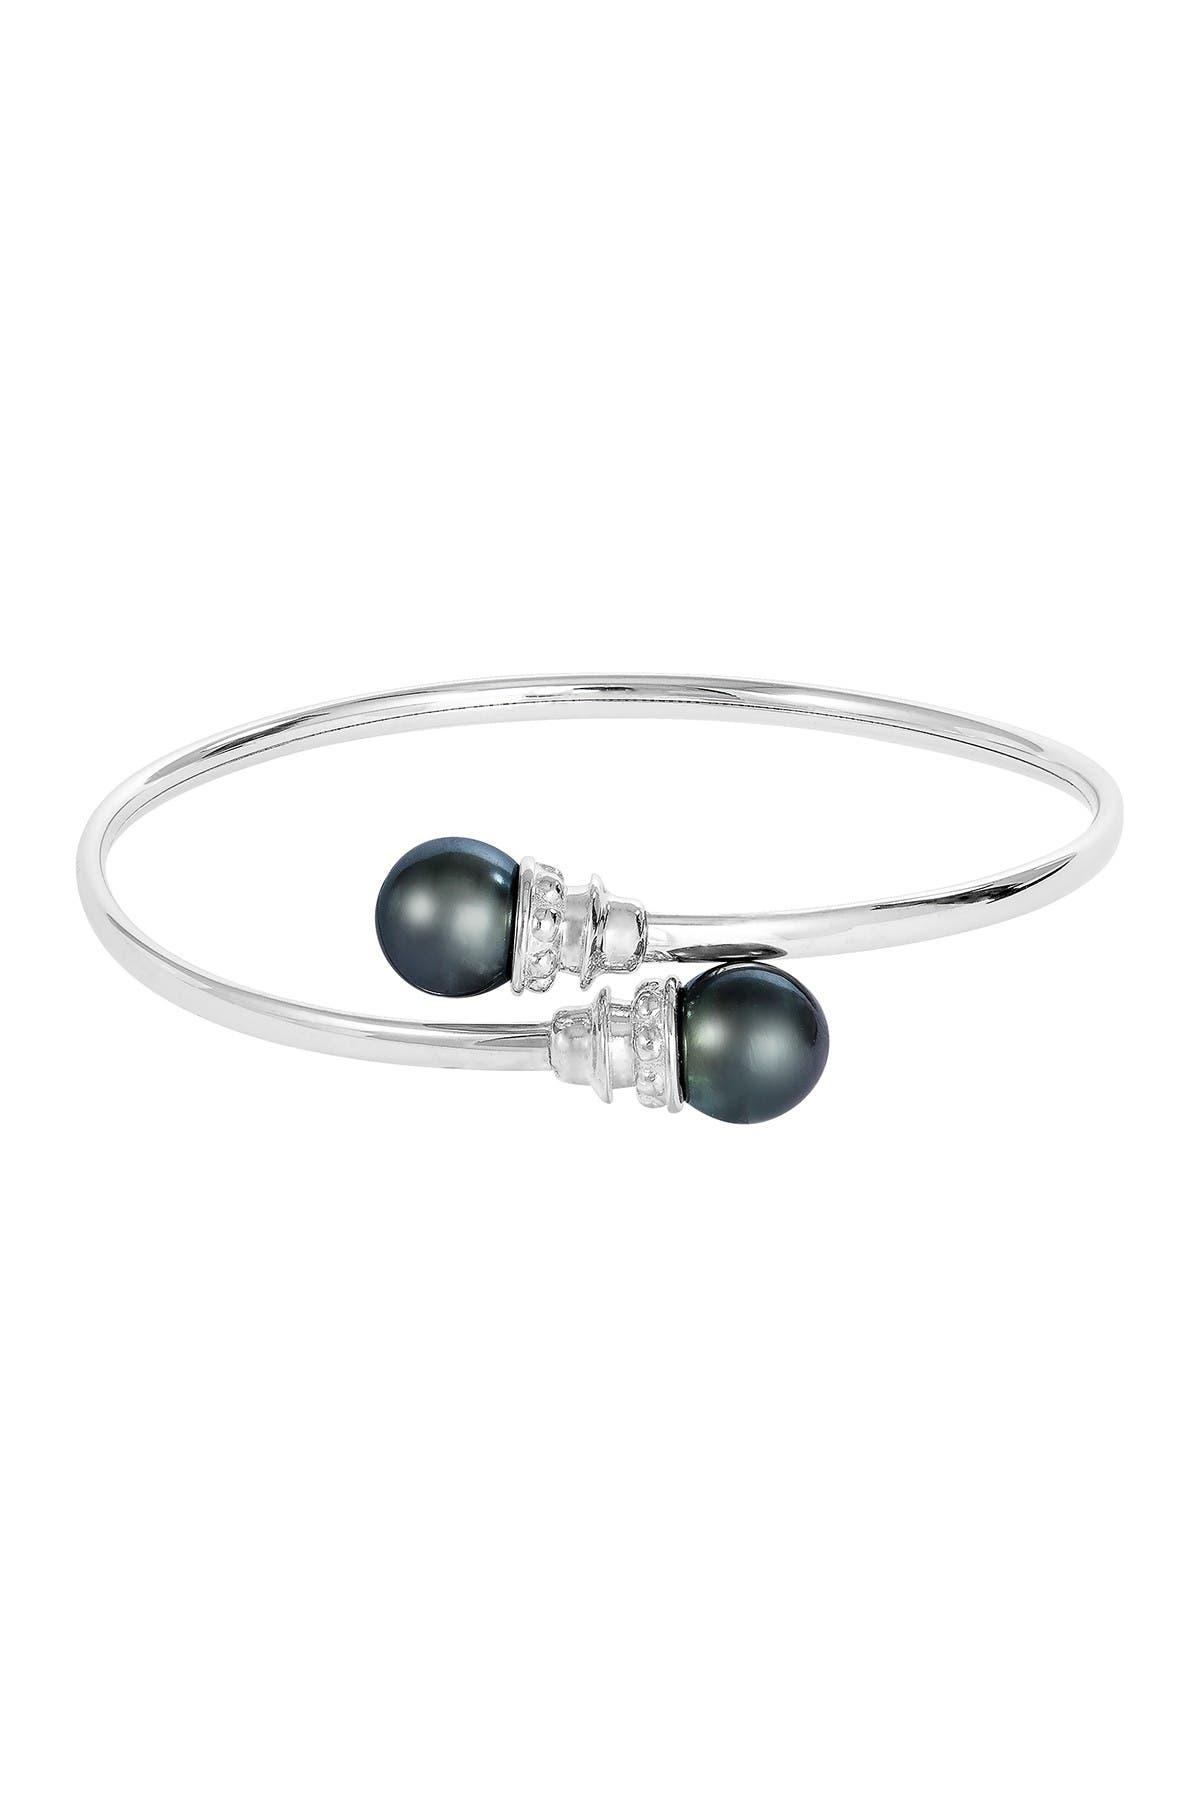 Image of Splendid Pearls Double 10-11mm Tahitian Pearl Bangle Bracelet